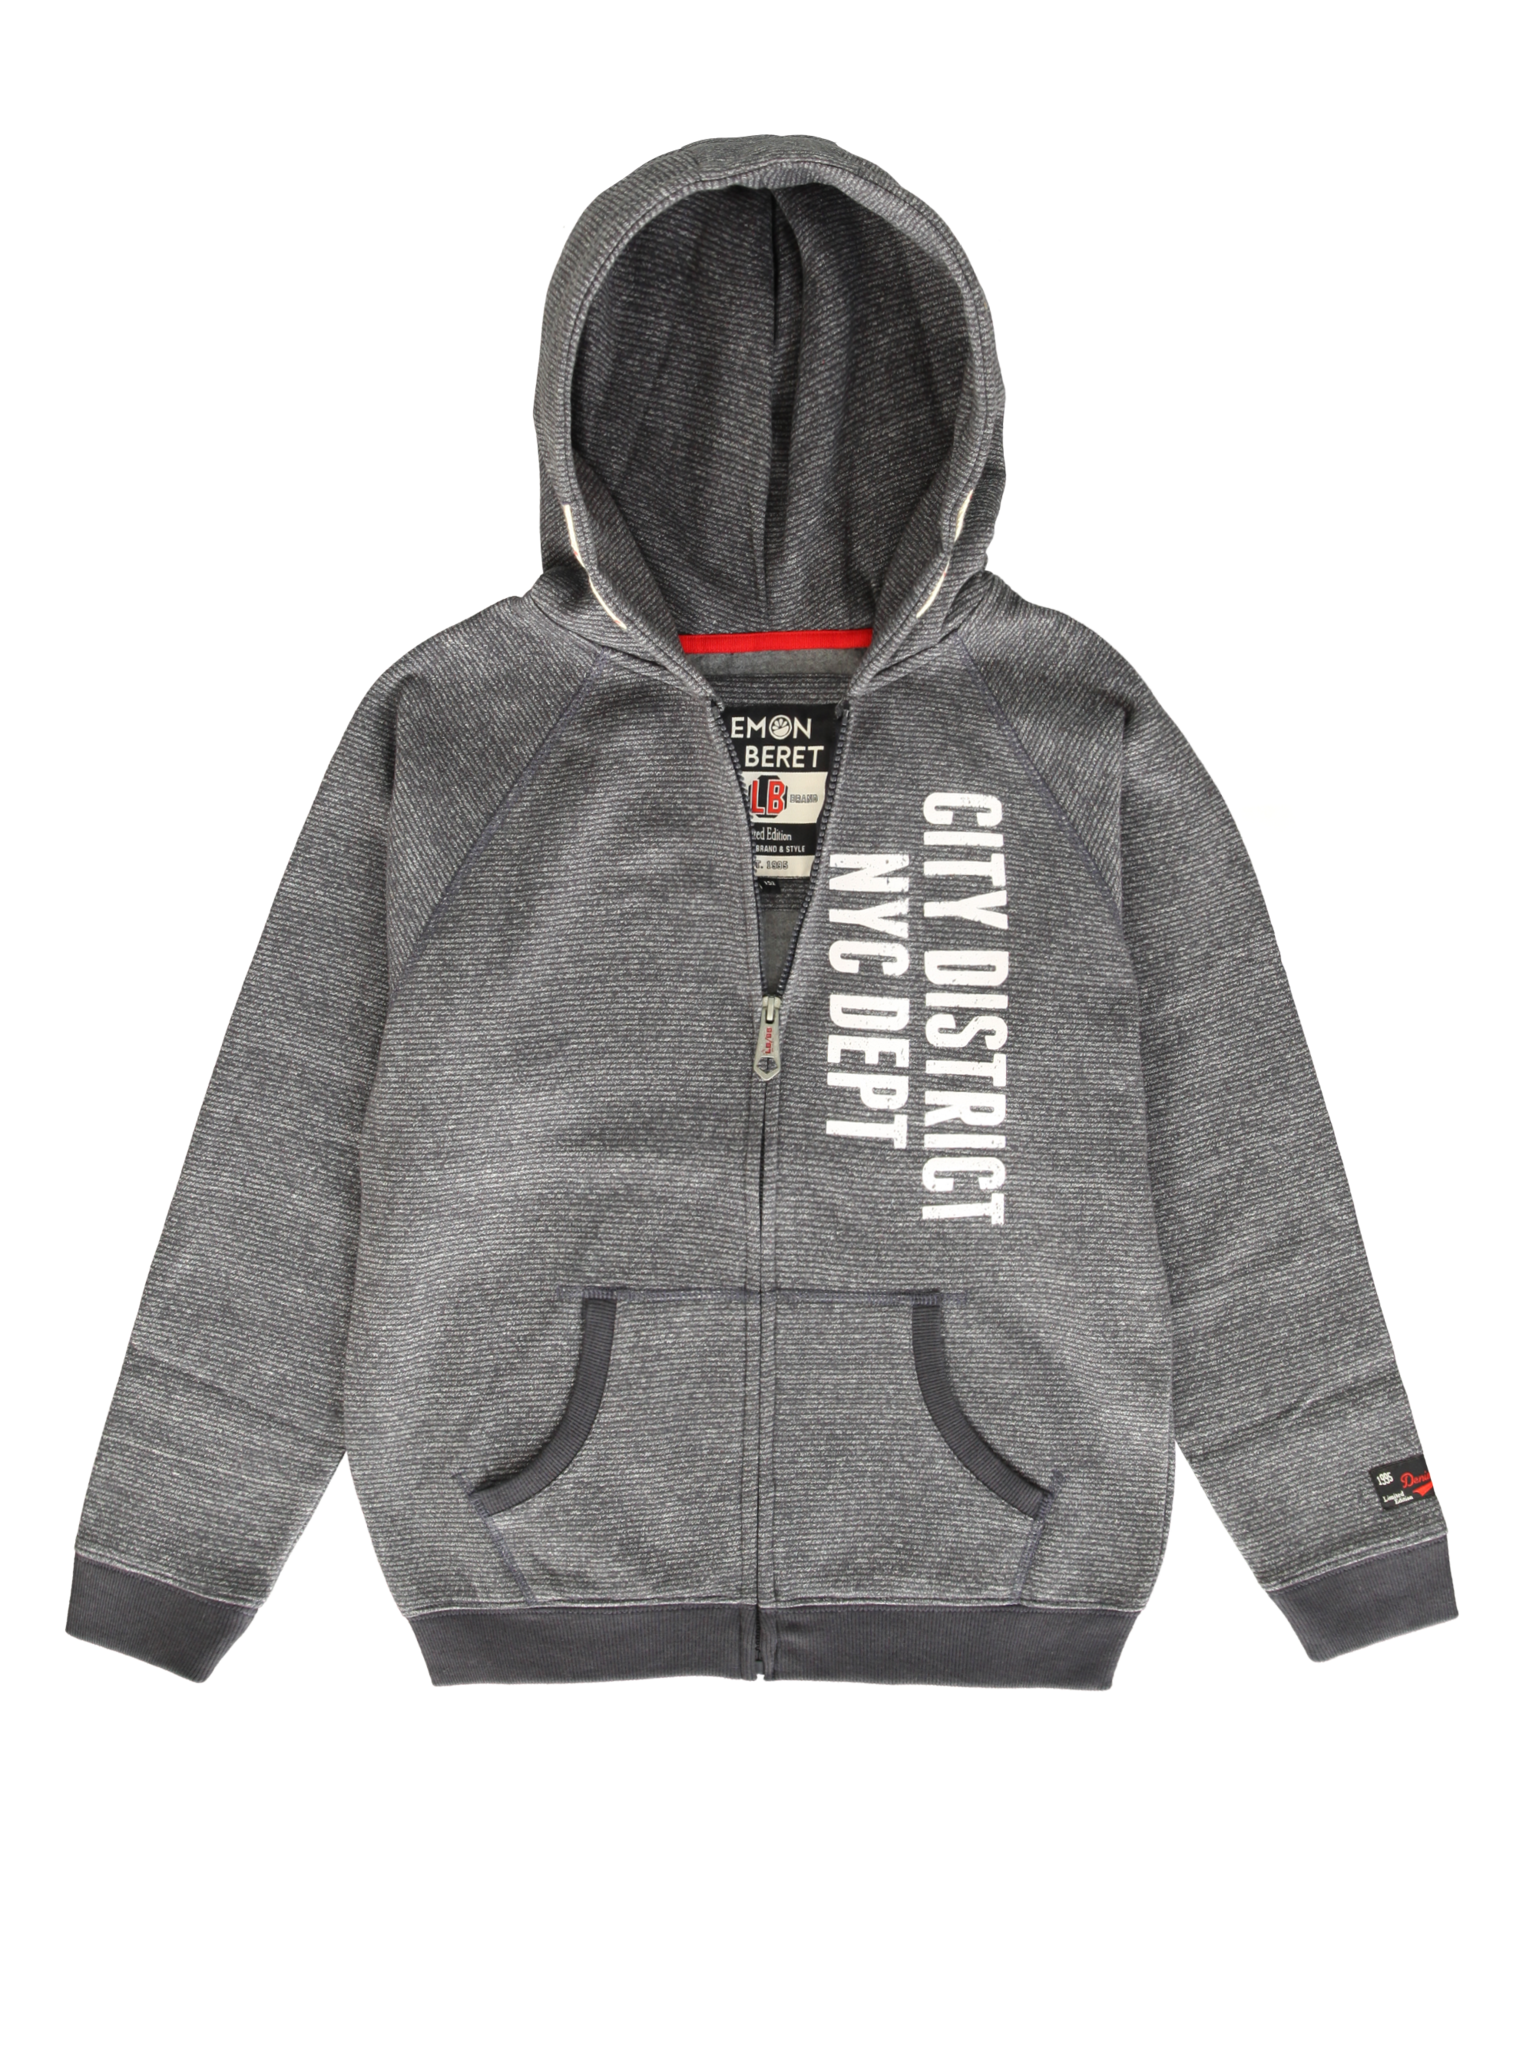 All Brands | Winterproducts Teen Boys | Cardigan Sweater | 12 pcs/box